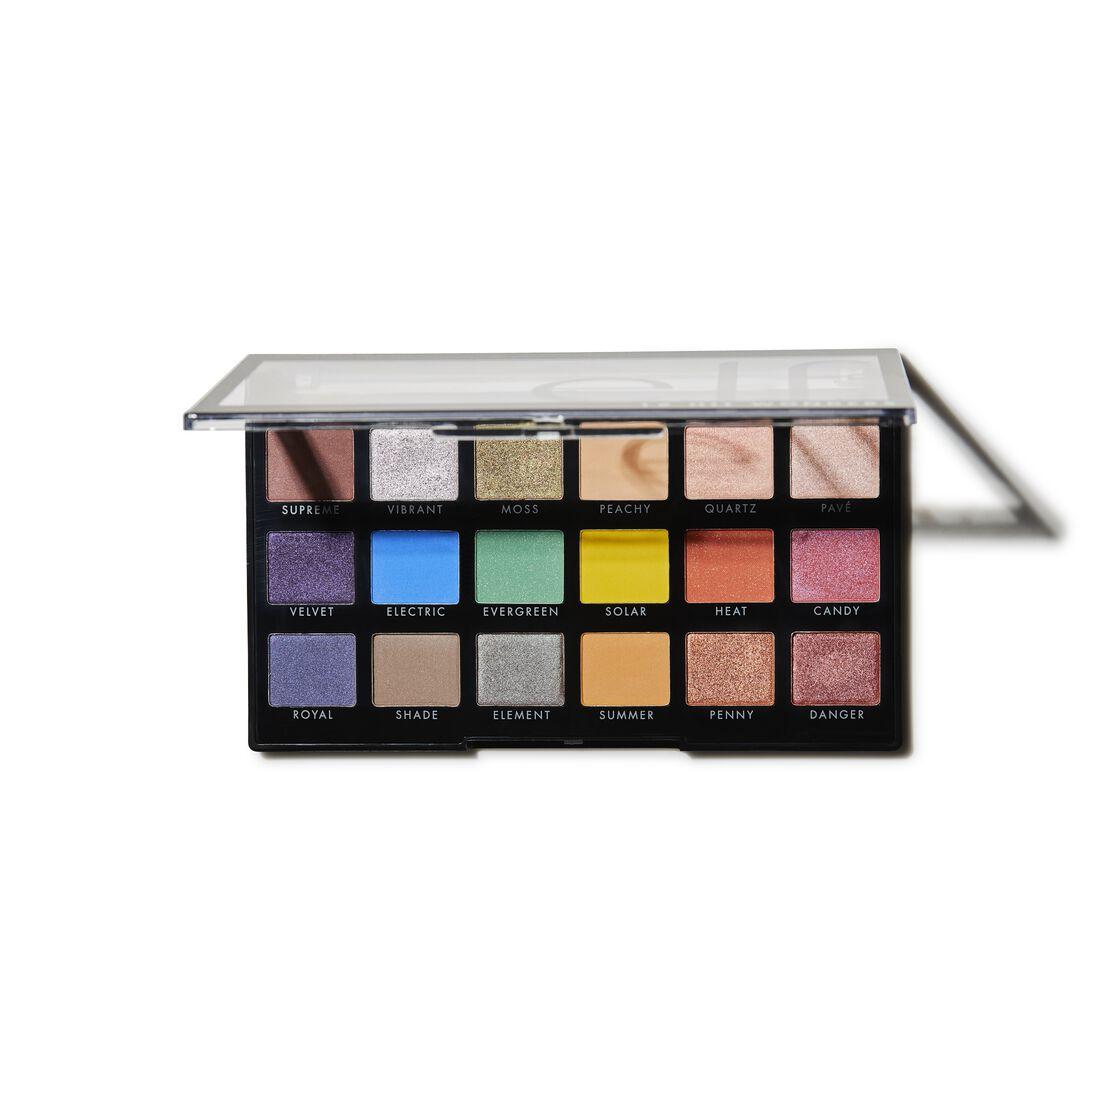 e.l.f. Cosmetics - 18 Hit Wonders Eyeshadow Palette